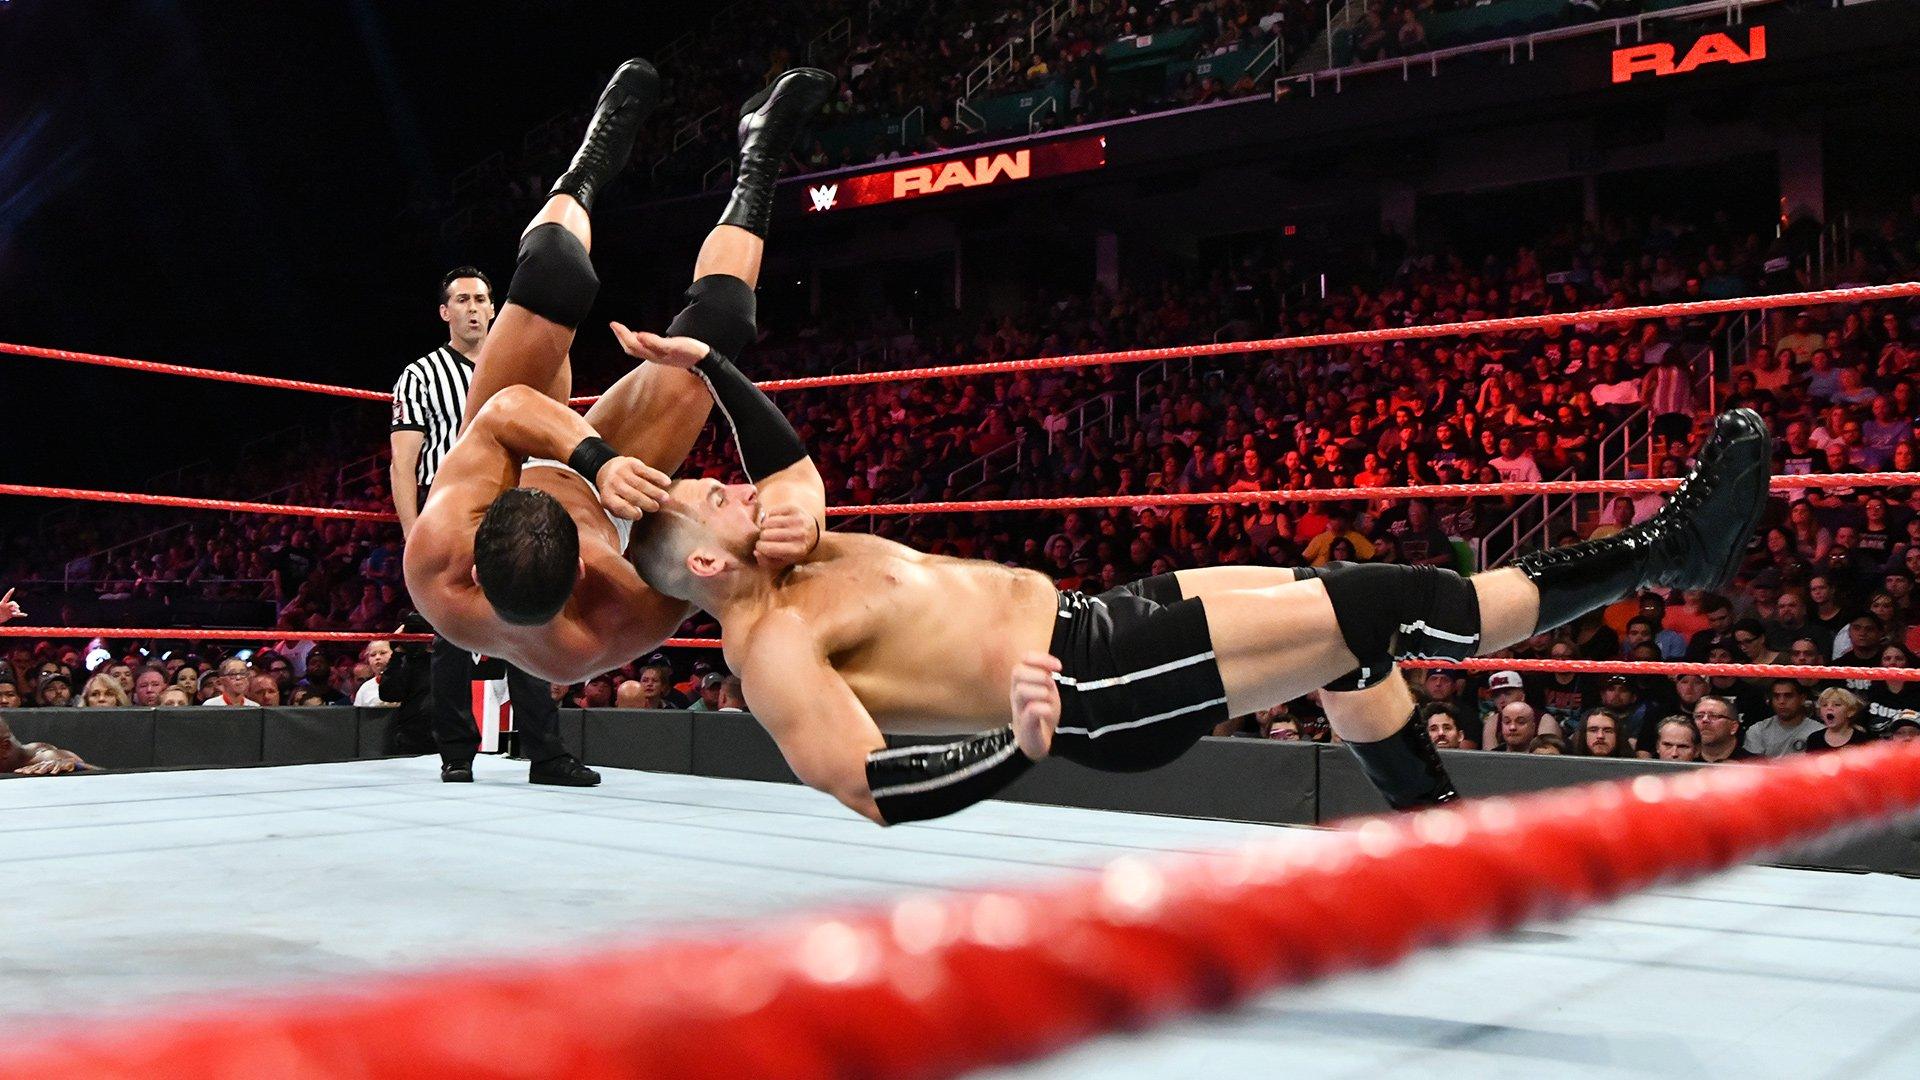 Bobby Roode & Titus Worldwide vs. Mojo Rawley & The Authors of Pain: Raw, 13 Août 2018